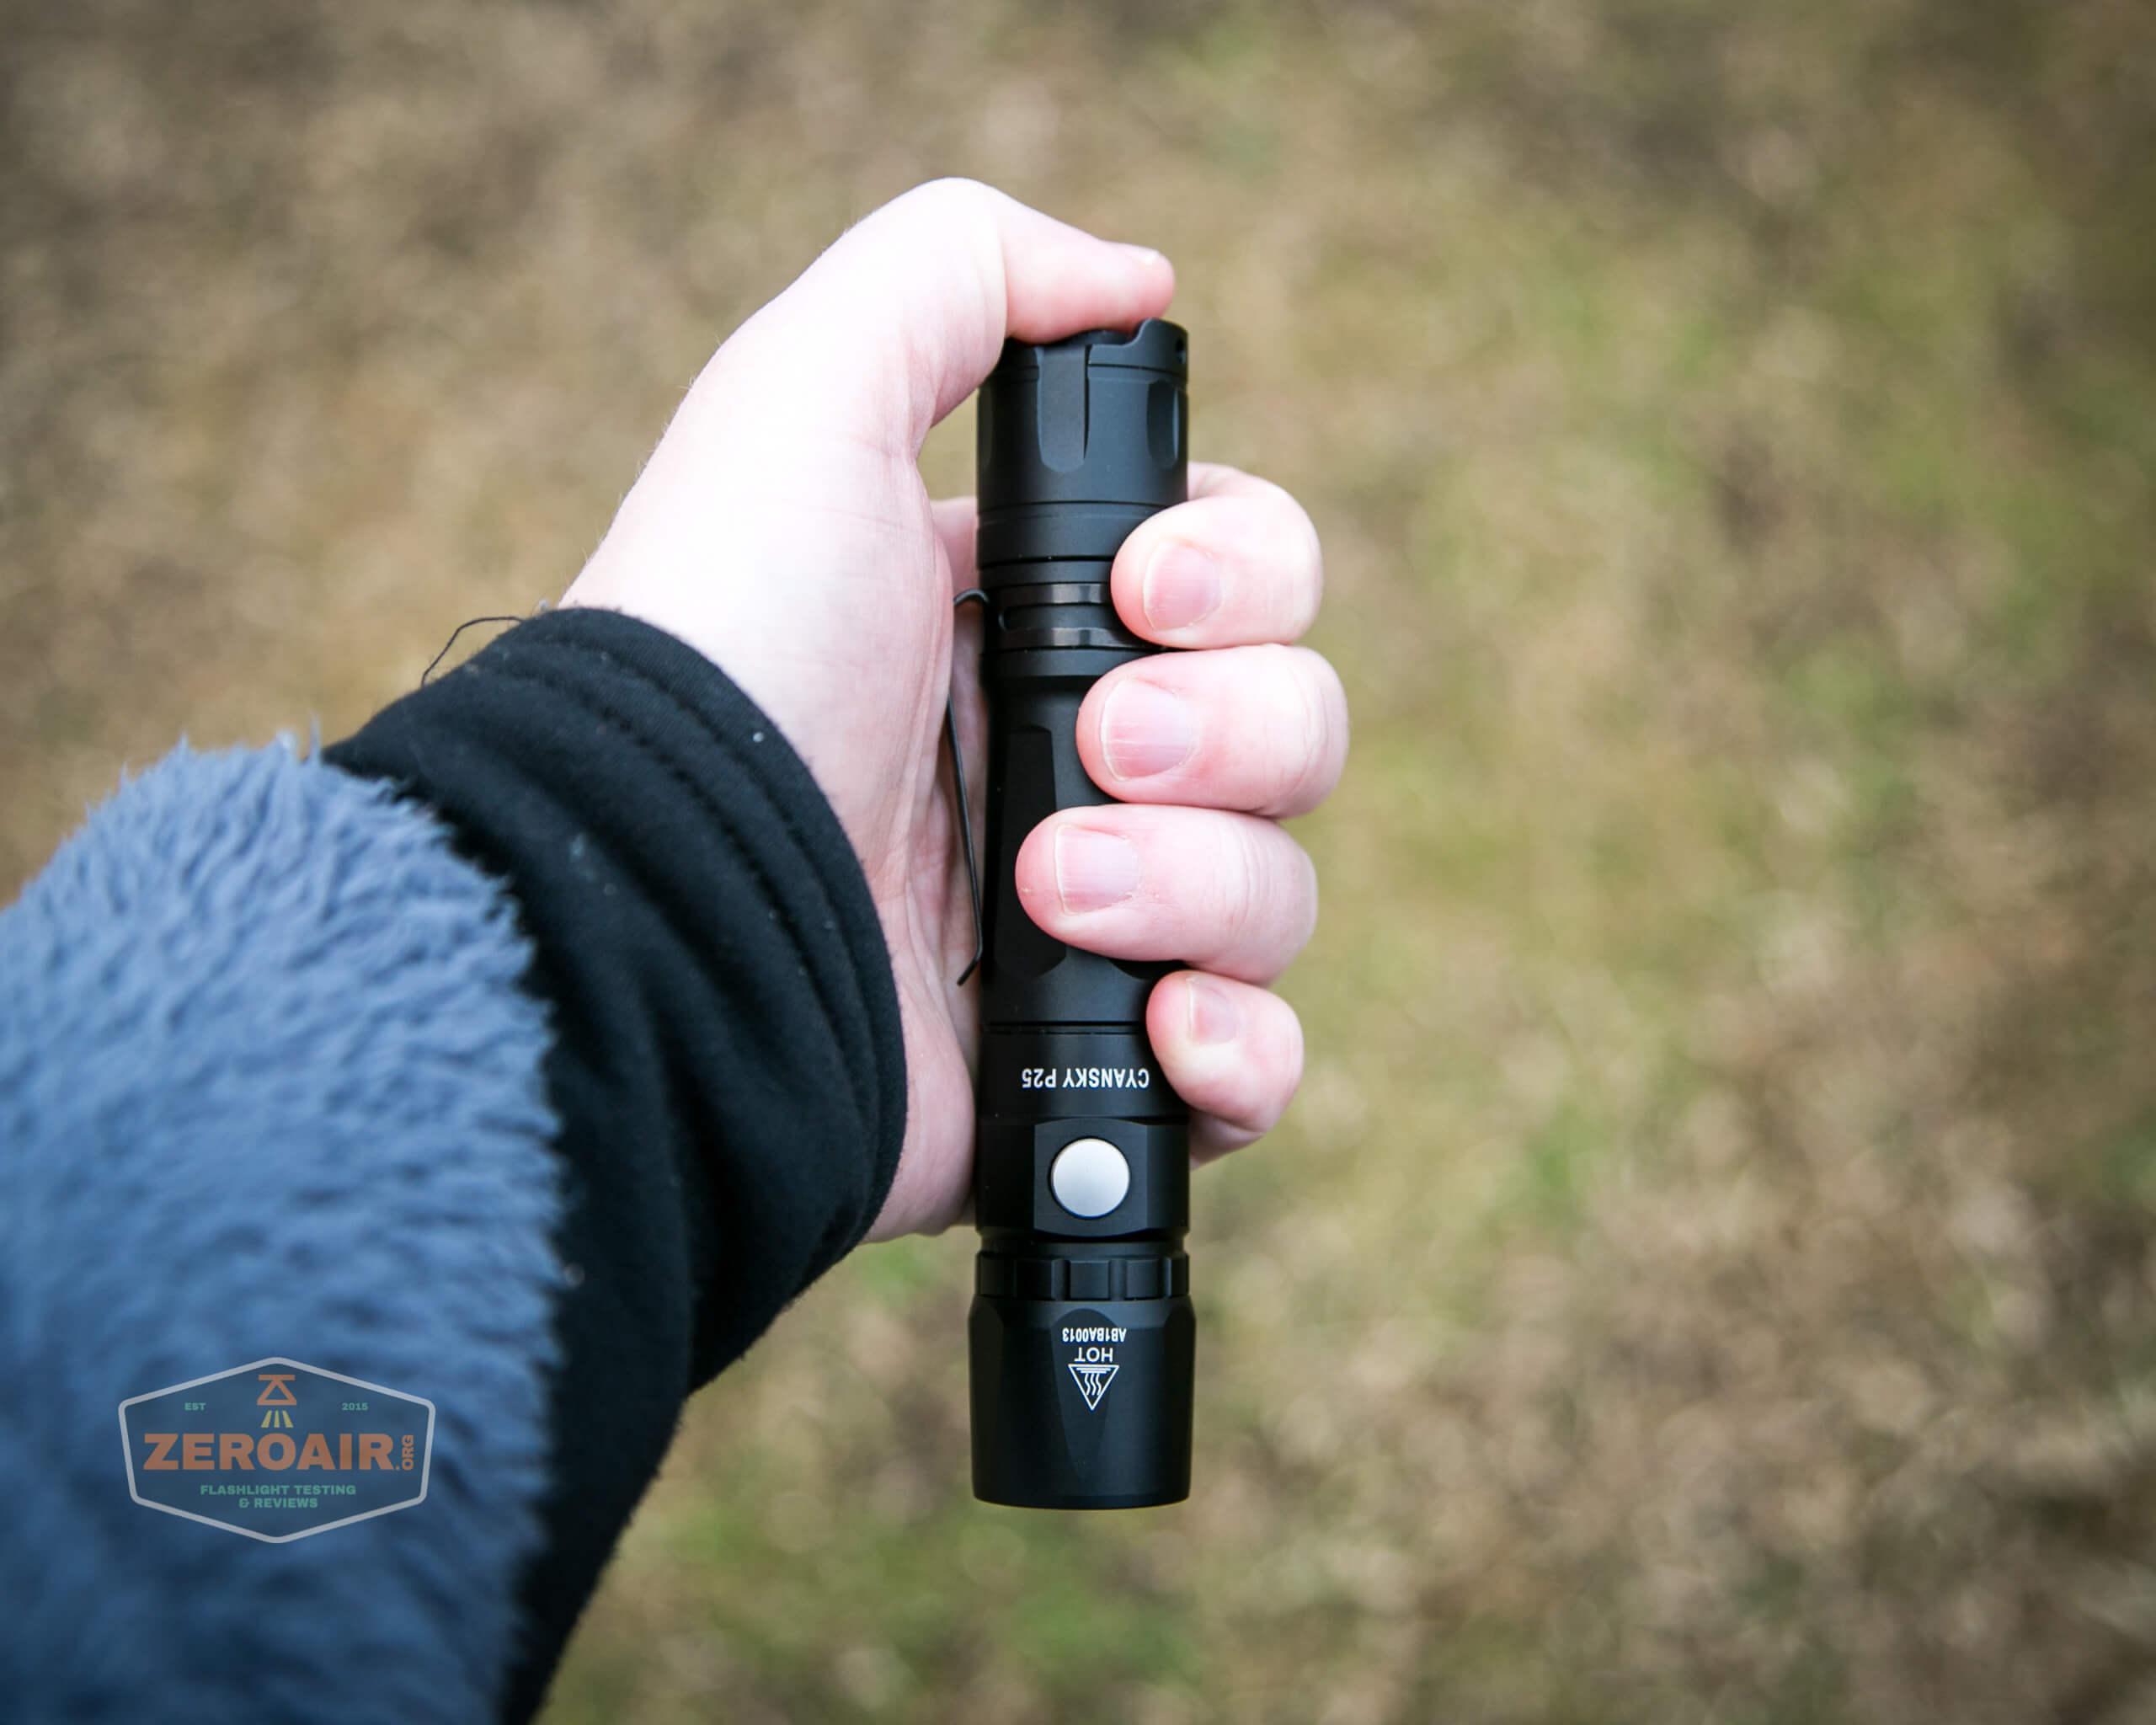 Cyansky P25 Flashlight in hand